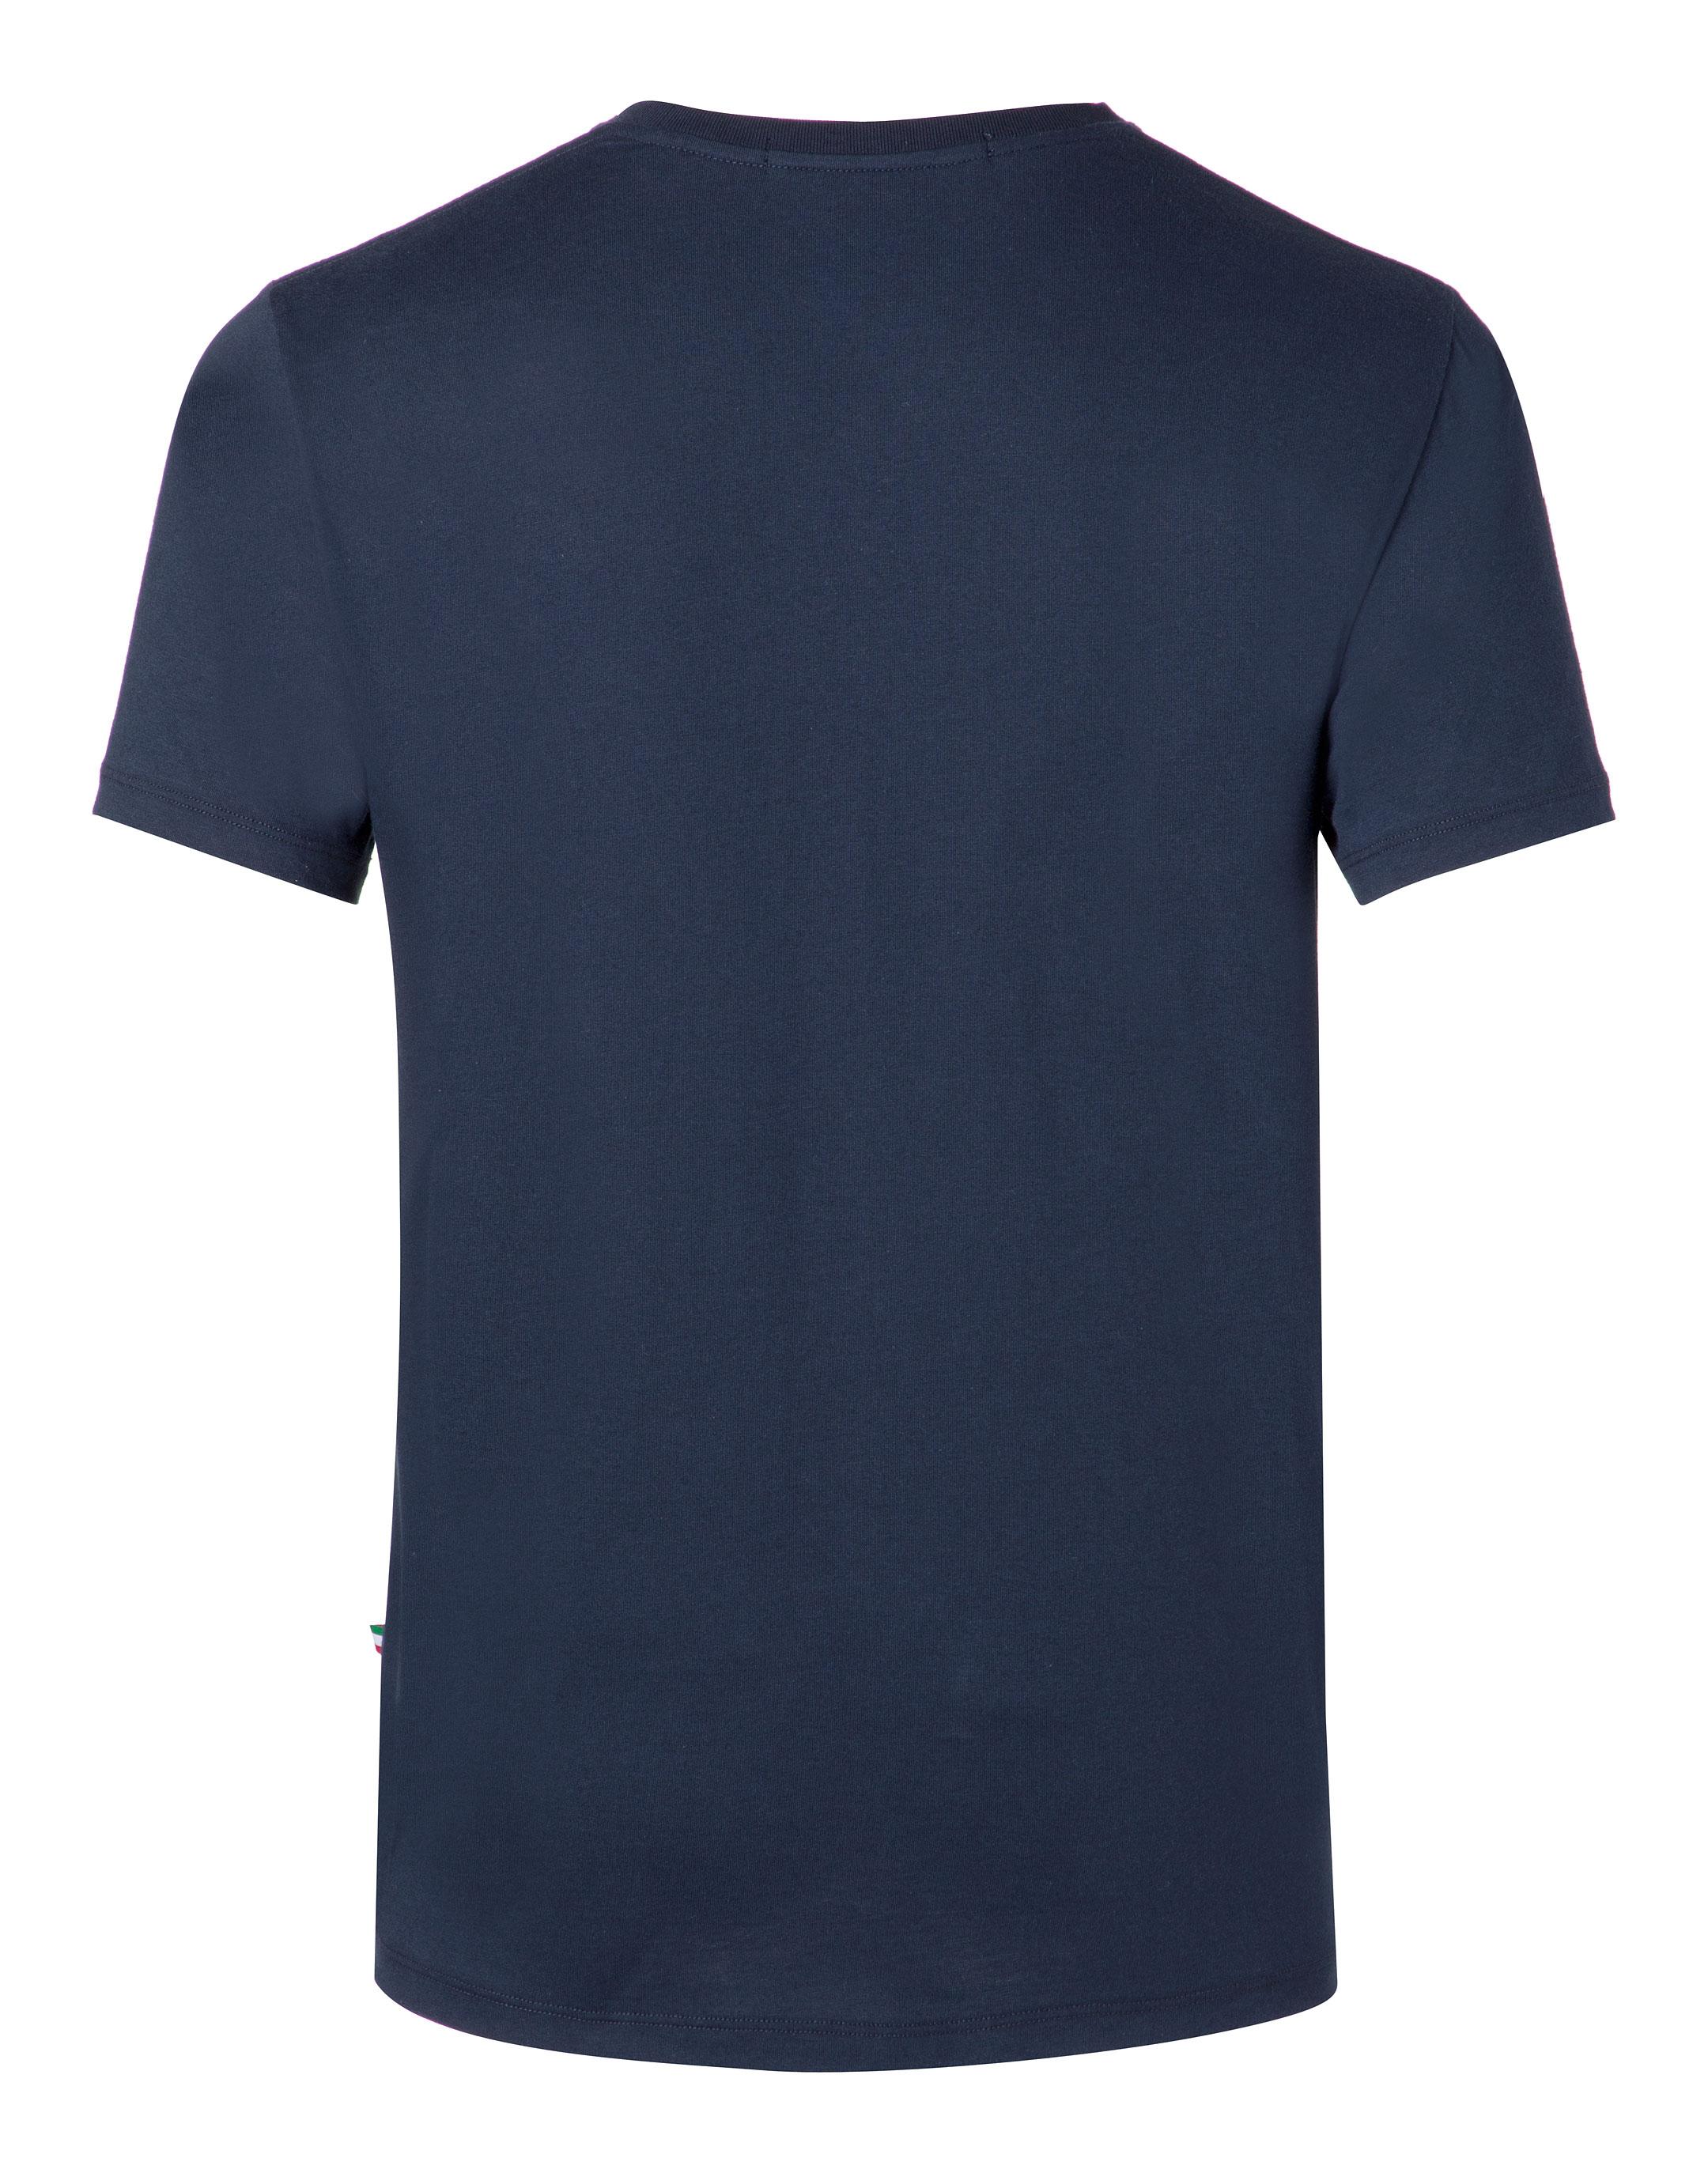 Black t shirt round neck - T Shirt Round Neck Ss Line